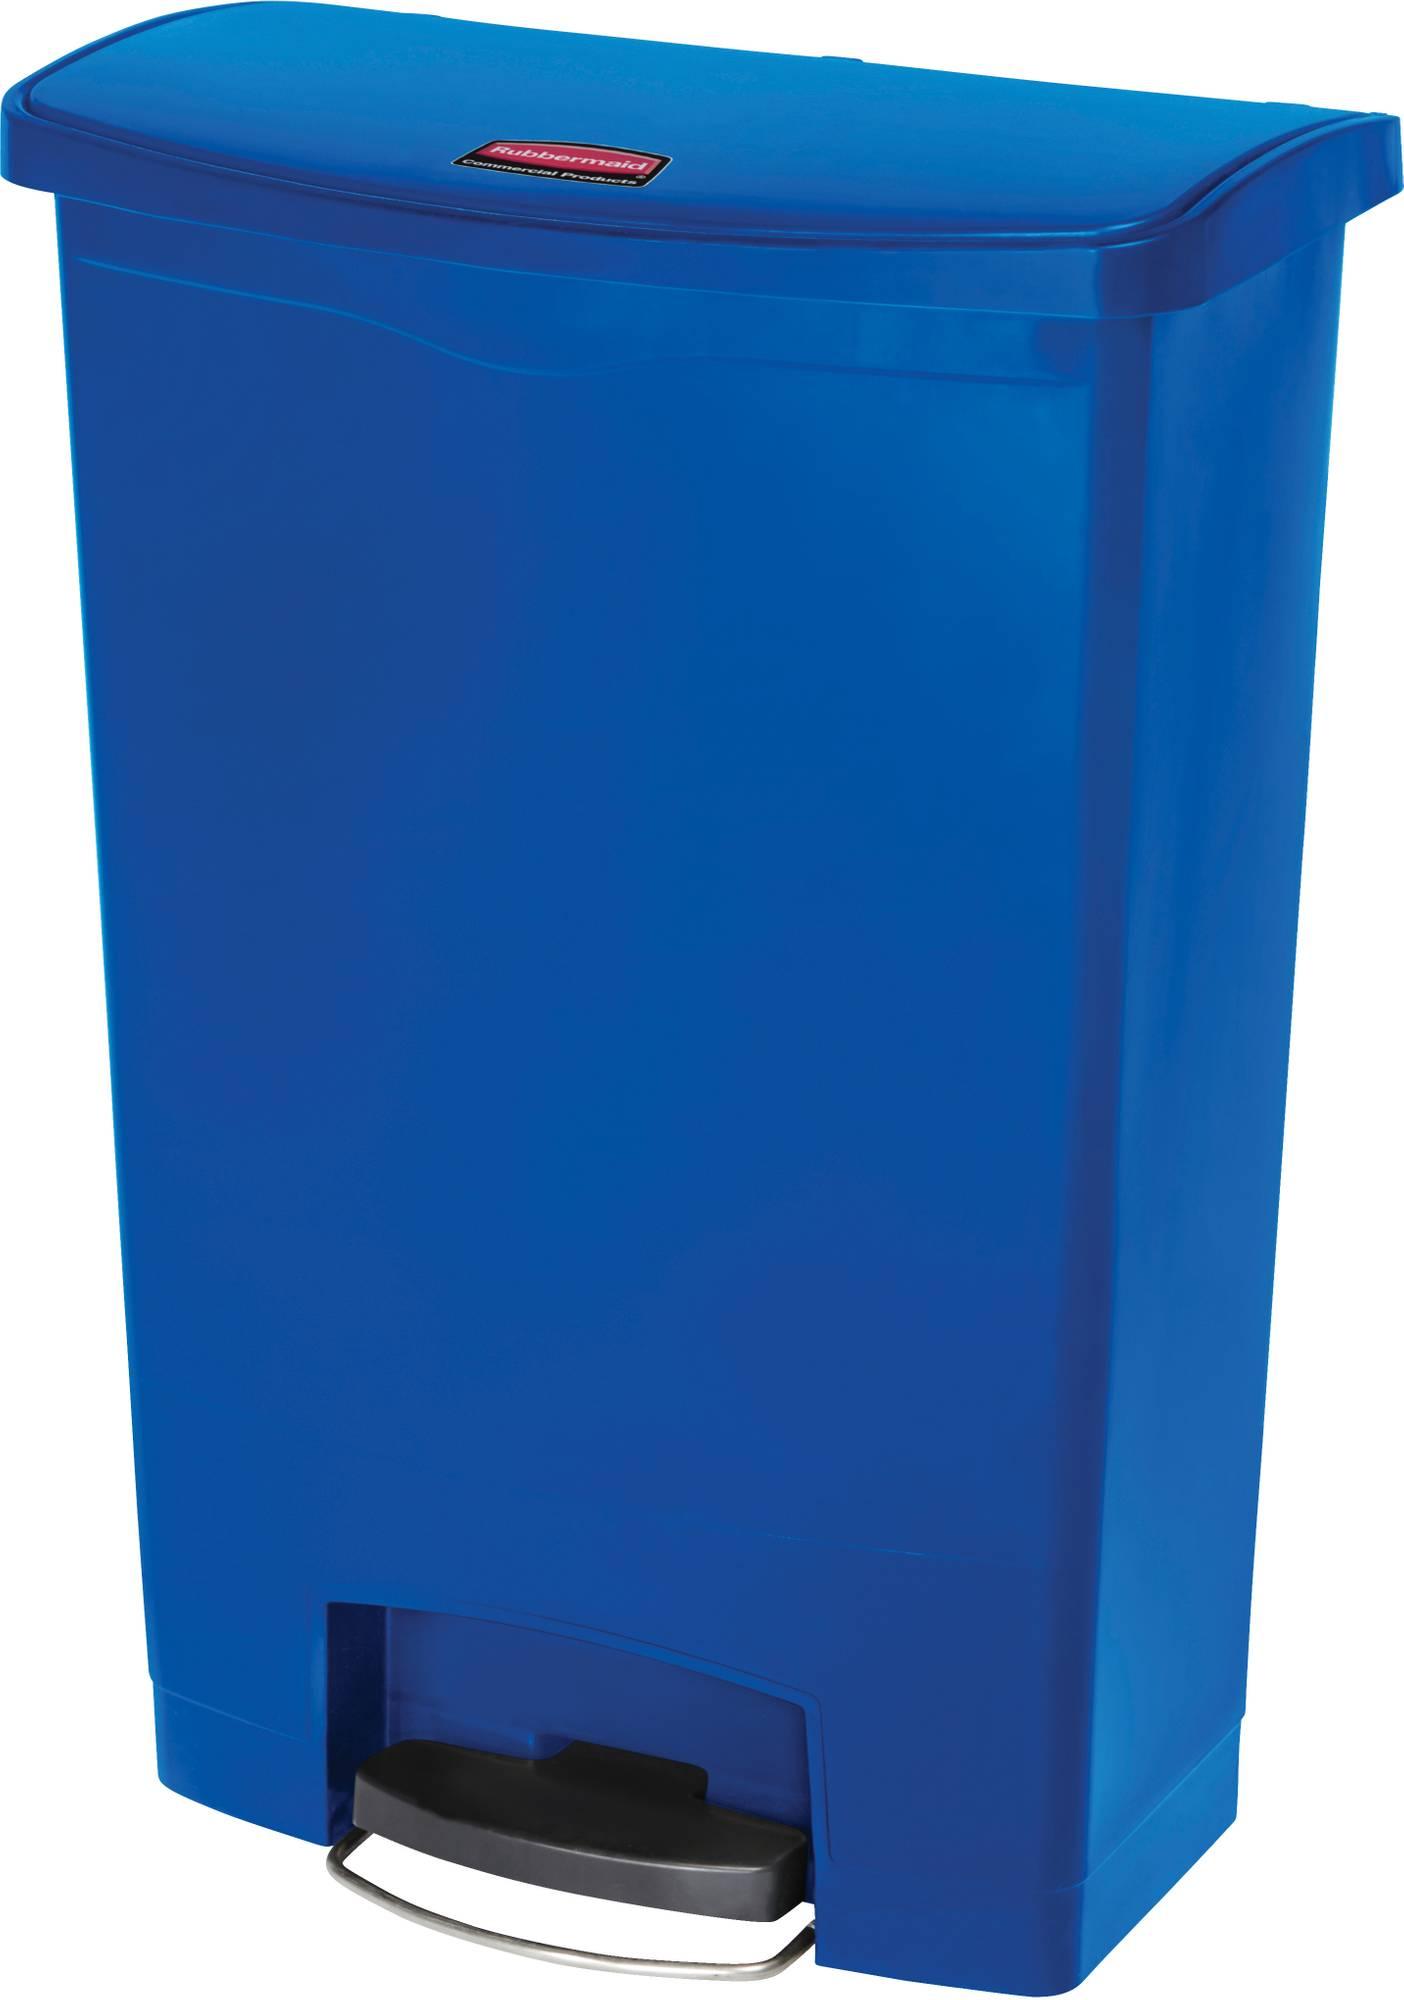 Rubbermaid Slim Jim Step On Container, Front Step mit 90 Liter Füllmenge in Blau